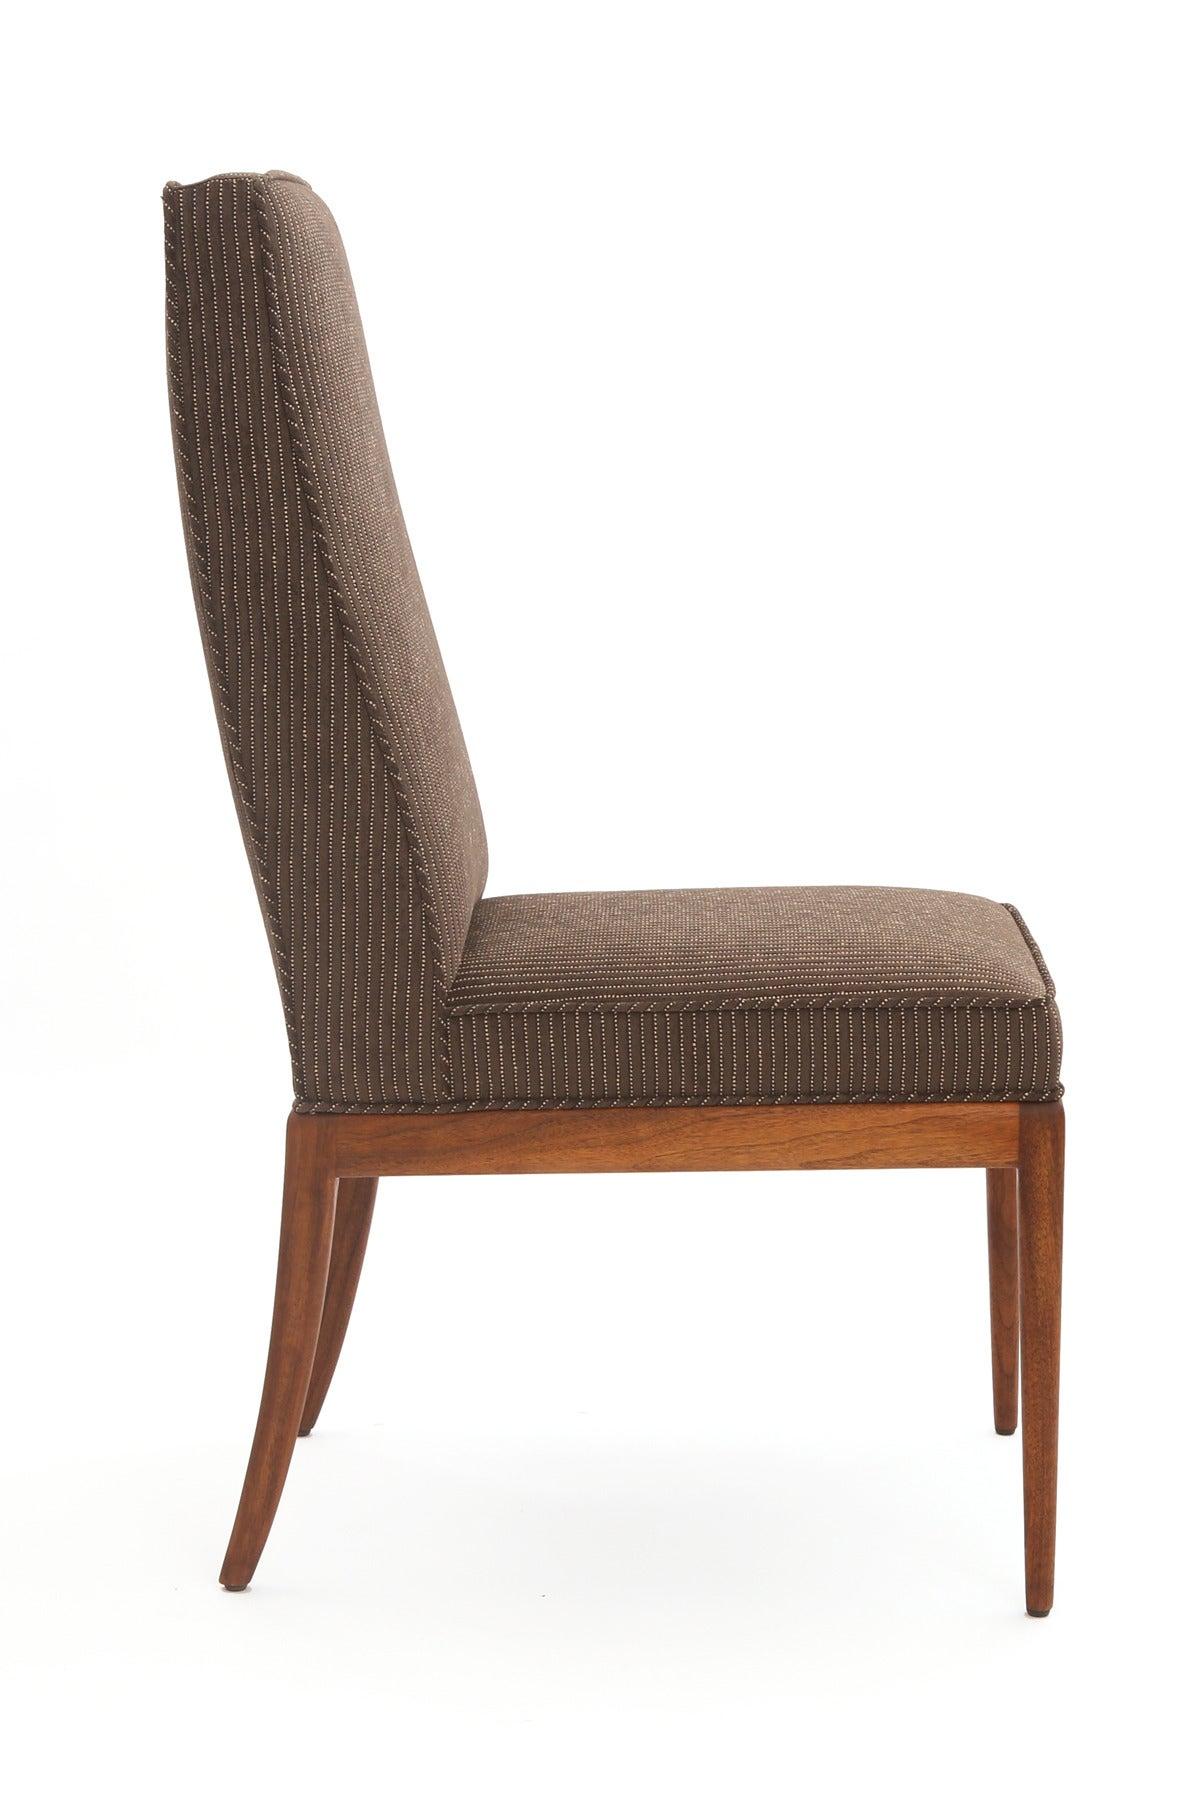 Six saber leg mahogany and upholstered dining chairs at for Upholstered dining chairs with black legs